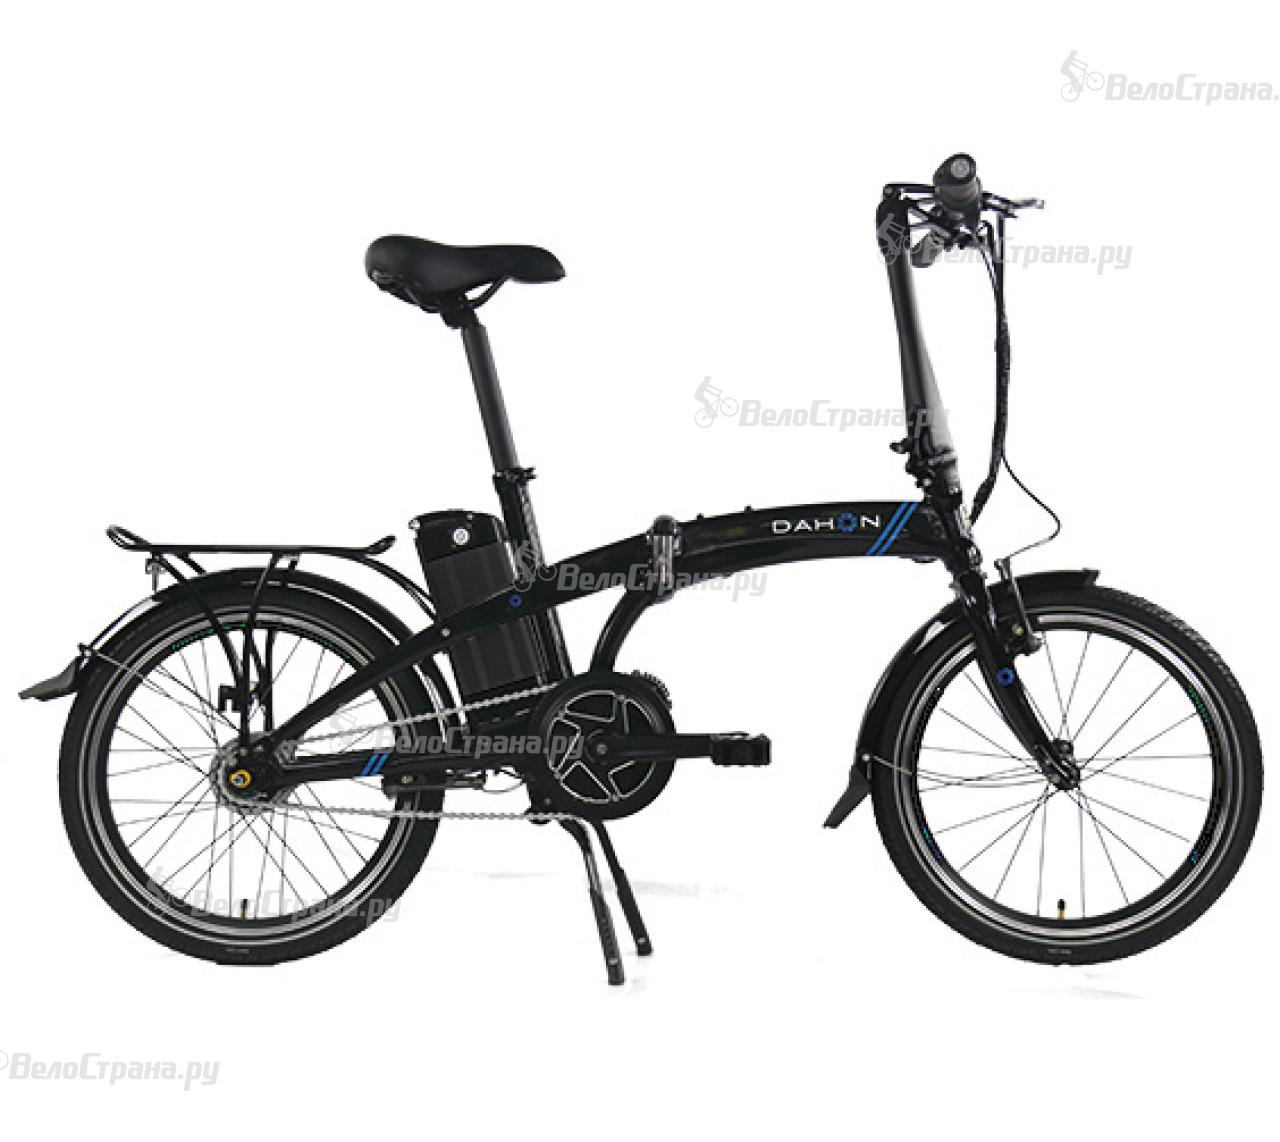 Велосипед Dahon E-Vigor i7 (2017) велосипед dahon vybe d7 u 2017